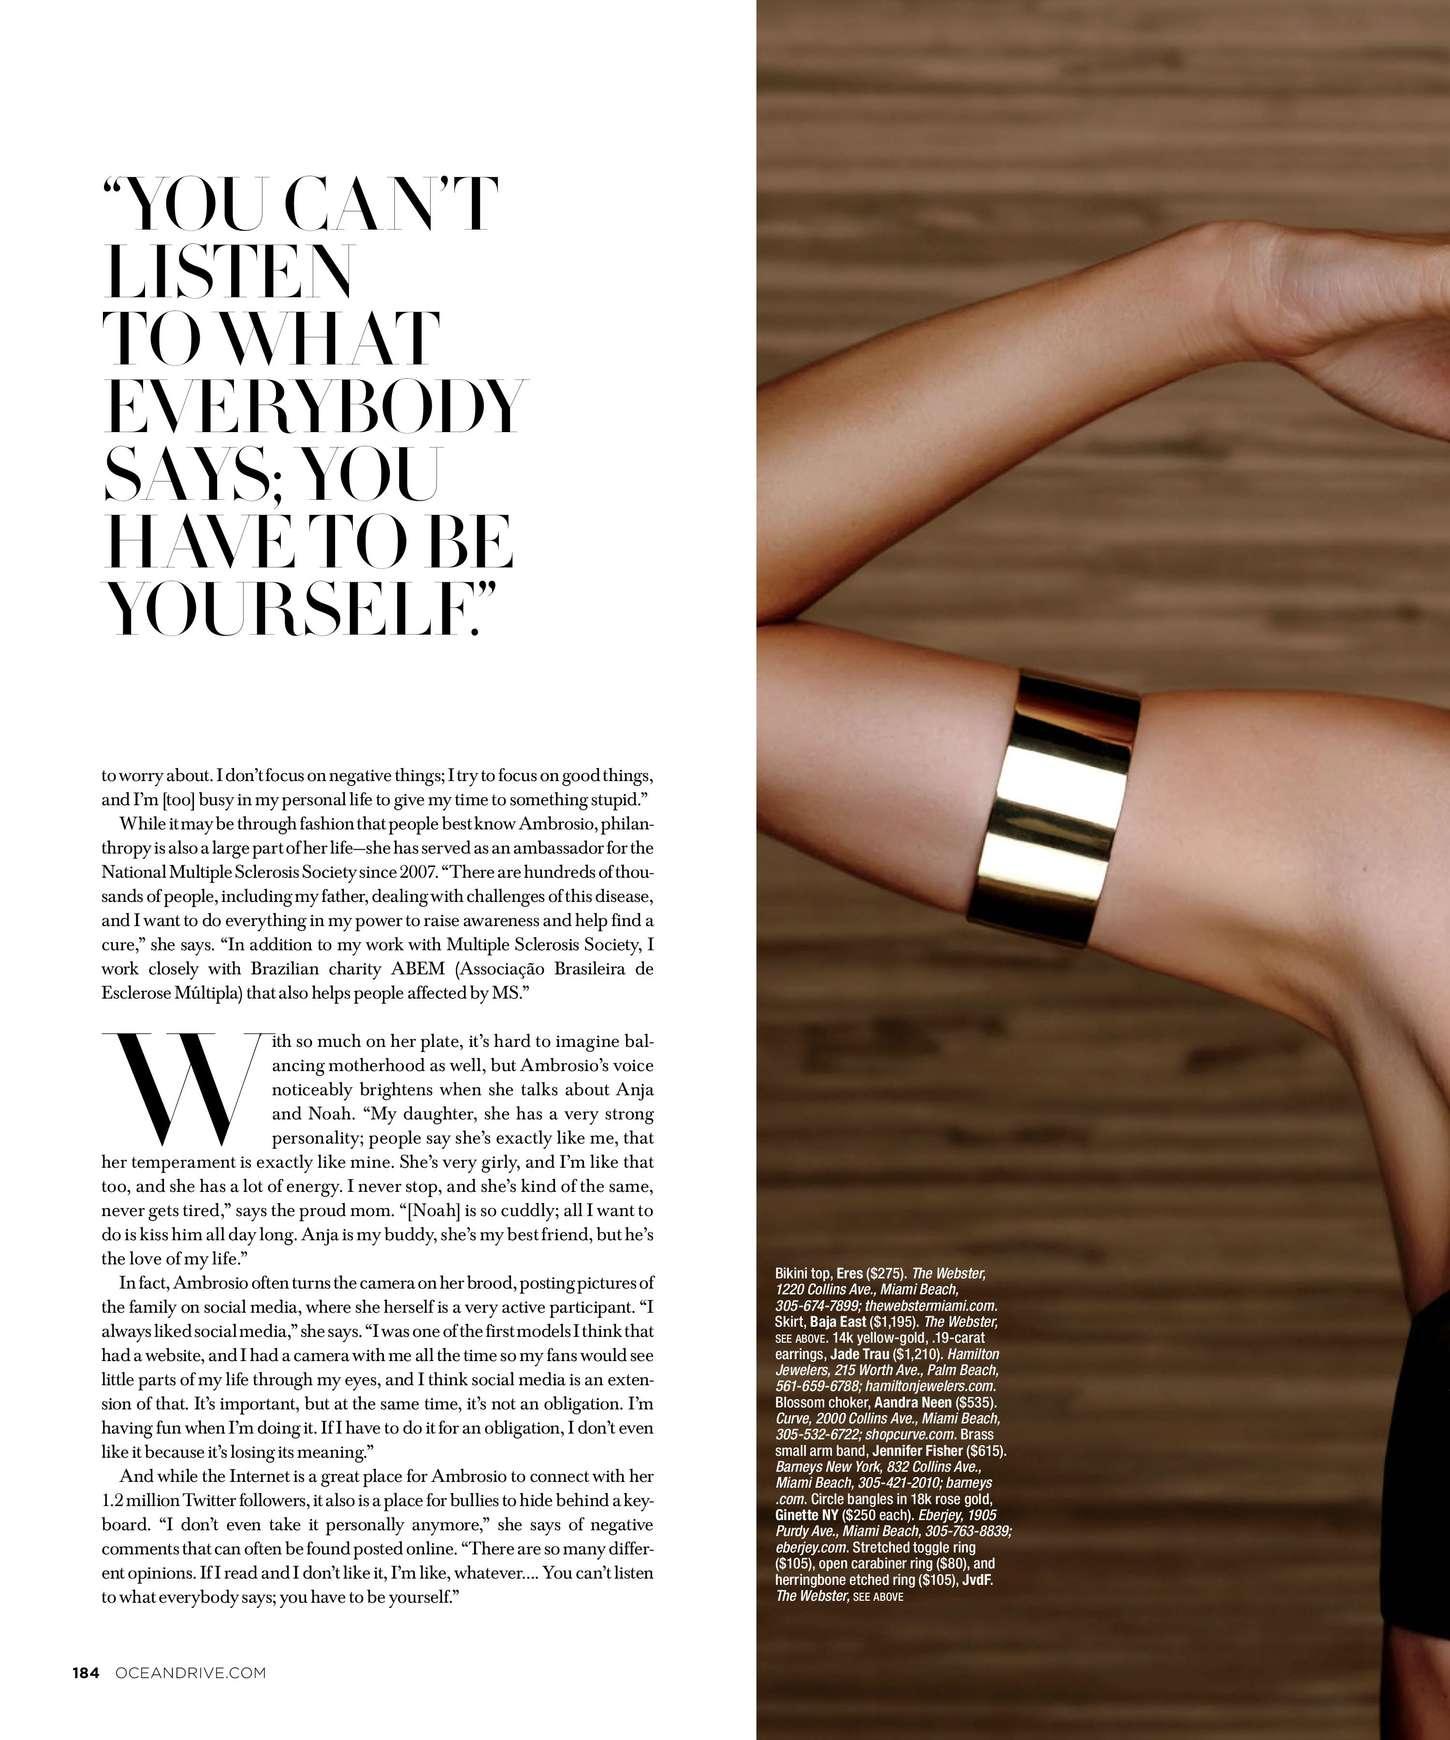 Alessandra Ambrosio 2015 : Alessandra Ambrosio: Ocean Drive 2015 -08